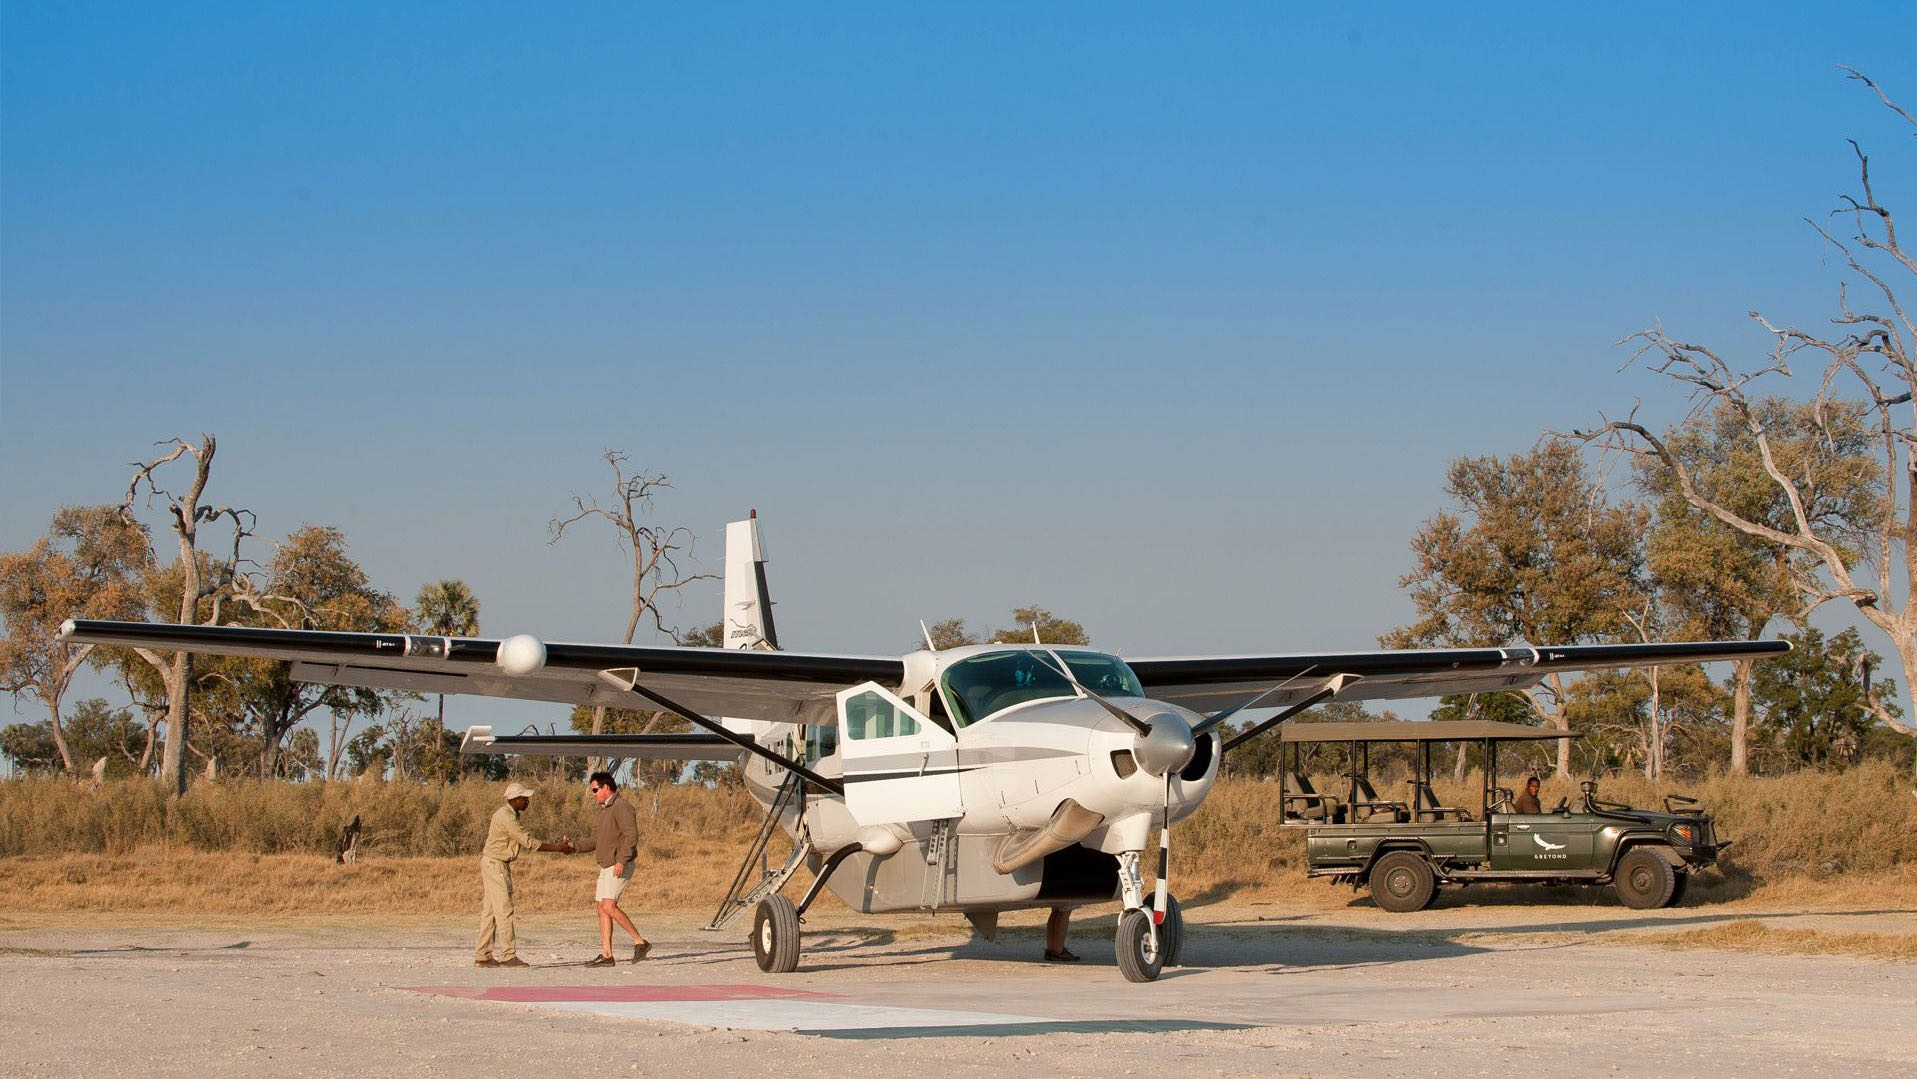 Impressions de voyage de Danielle & Michel, Fly-in Botswana, Zimbabwe – Septembre 2019